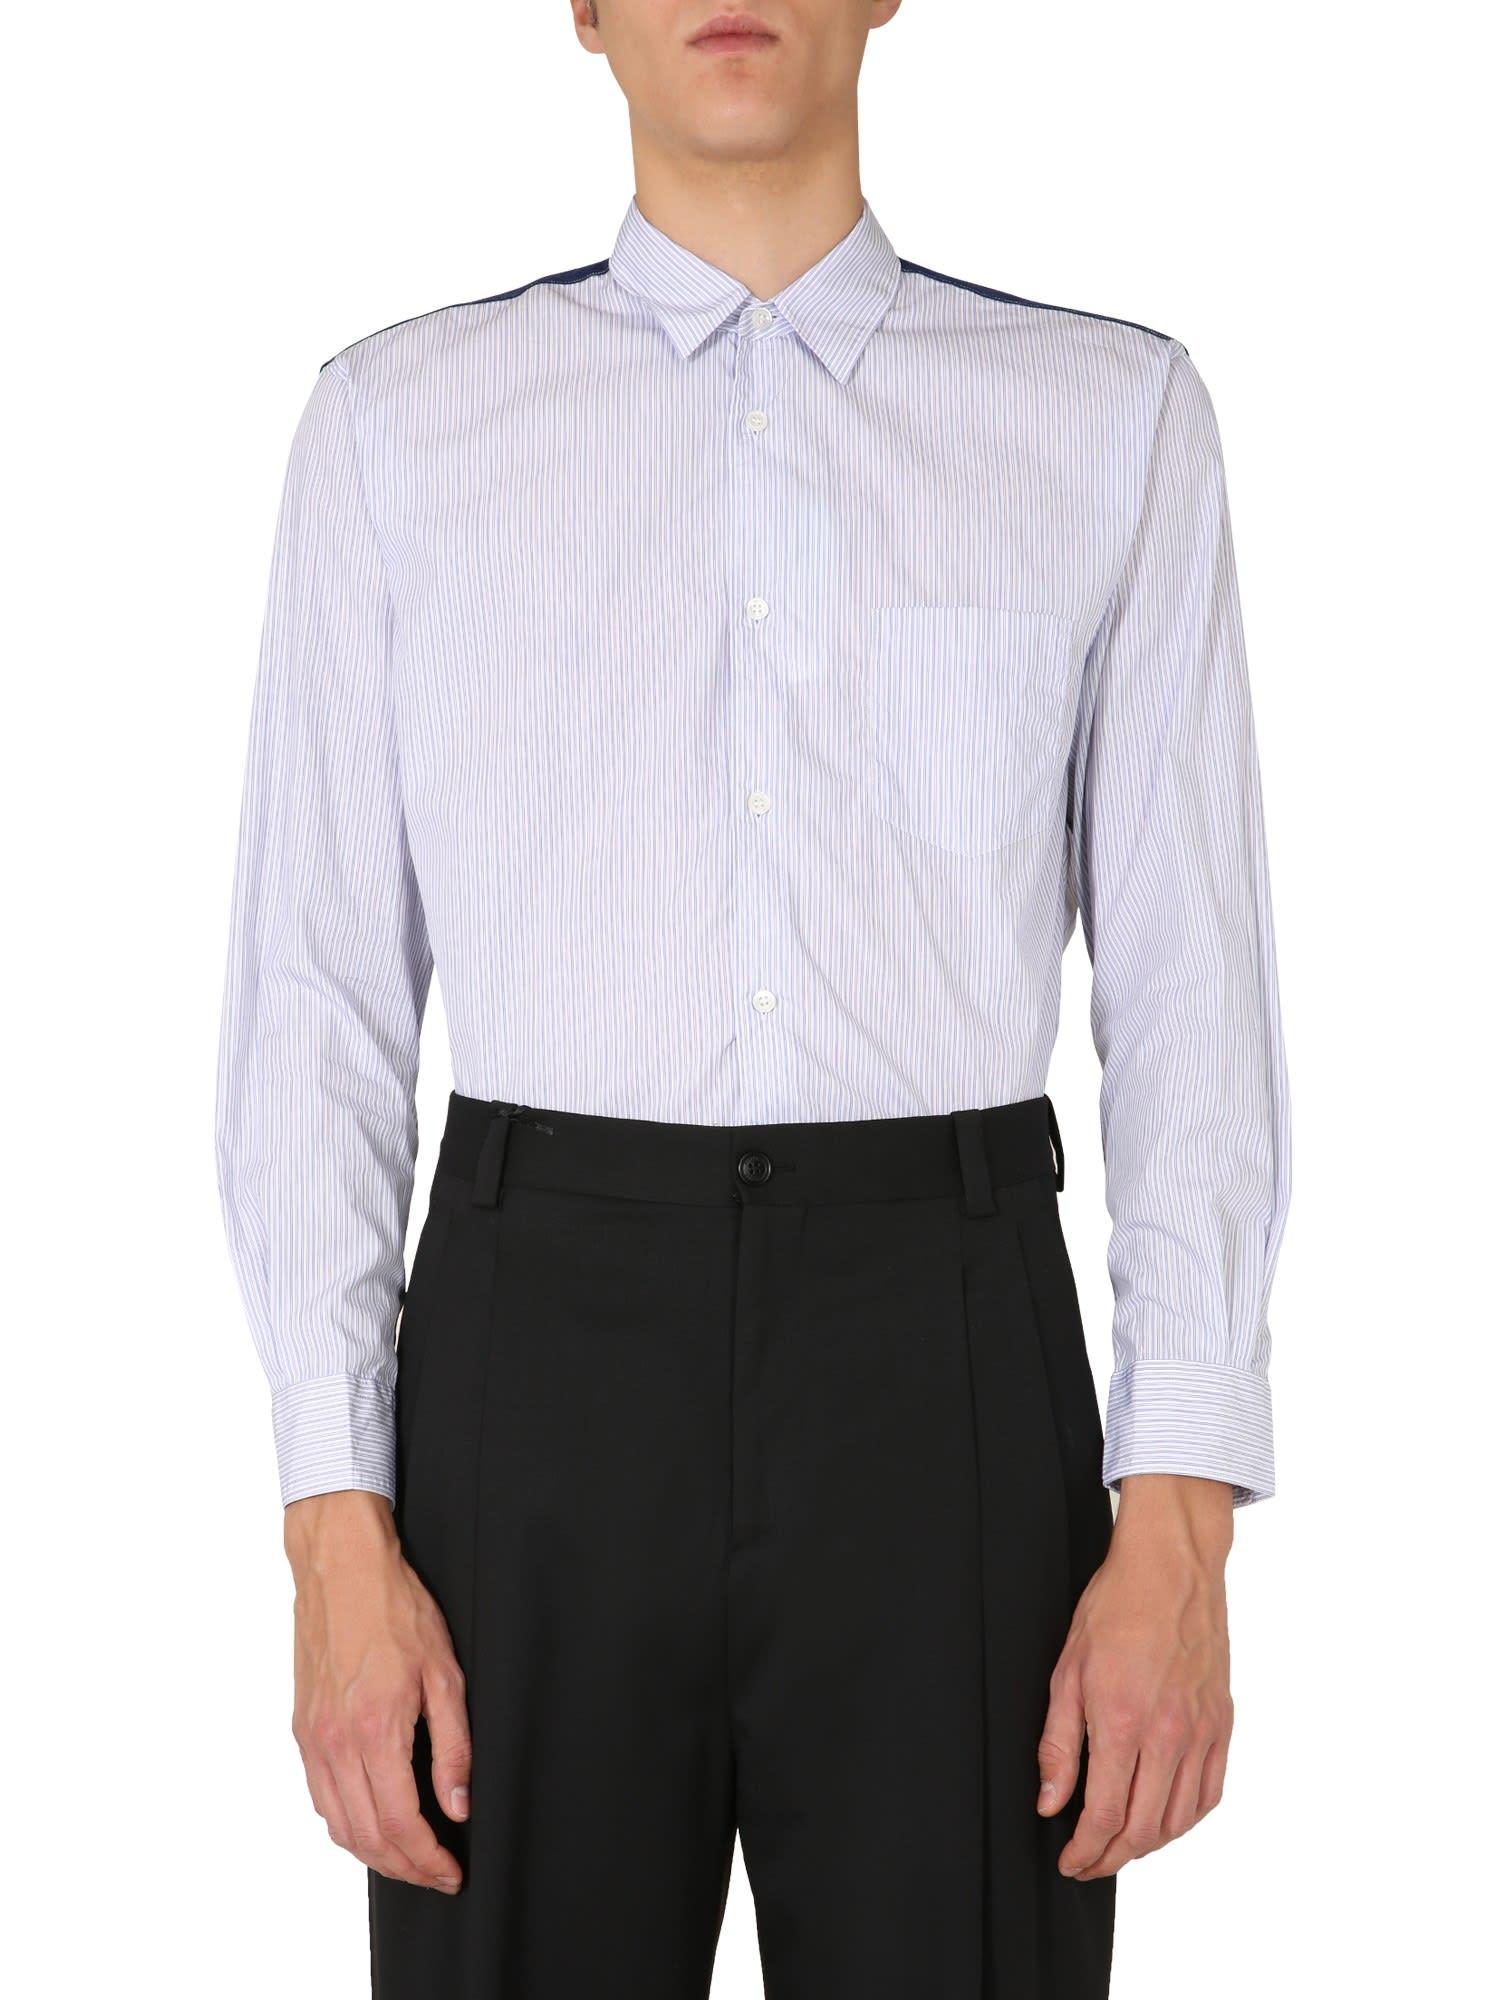 Comme Des Garçons Shirt SLIM FIT SHIRT